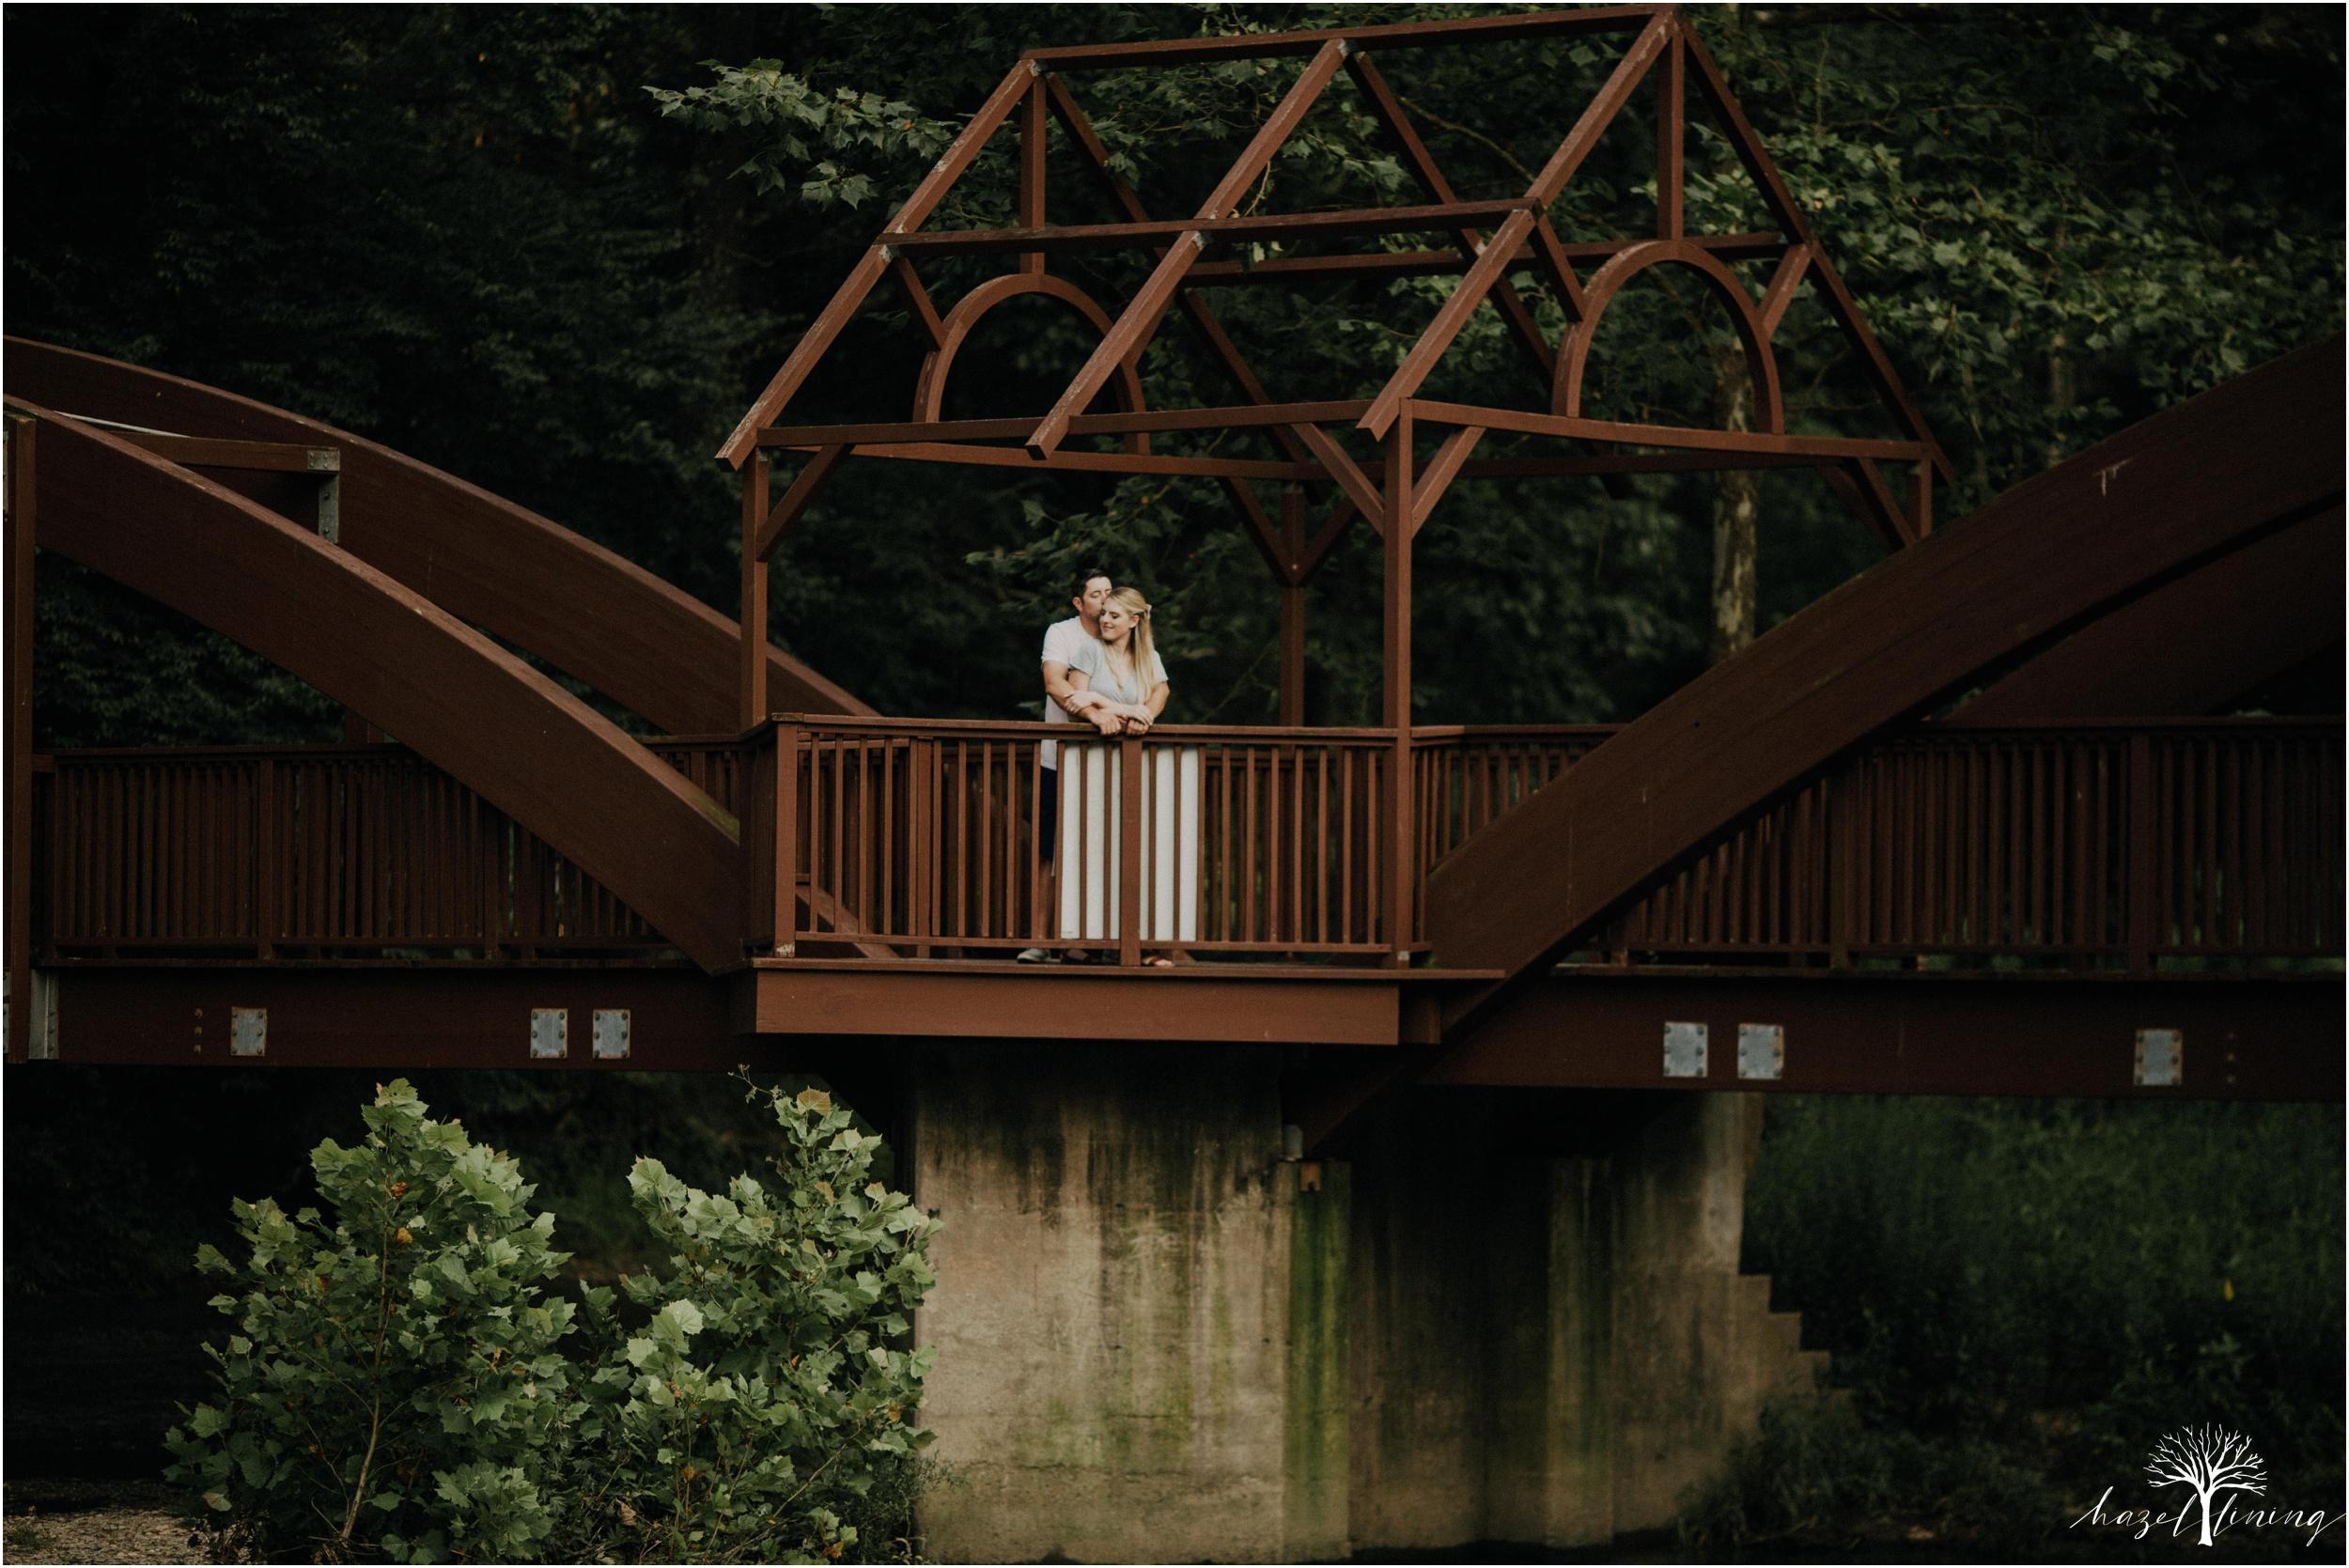 ashley-fillmore-steve-reimer-trexler-nature-preserve-summer-engagement-session-schnecksville-pennsylvania-hazel-lining-photography-destination-elopement-wedding-engagement-photography_0015.jpg